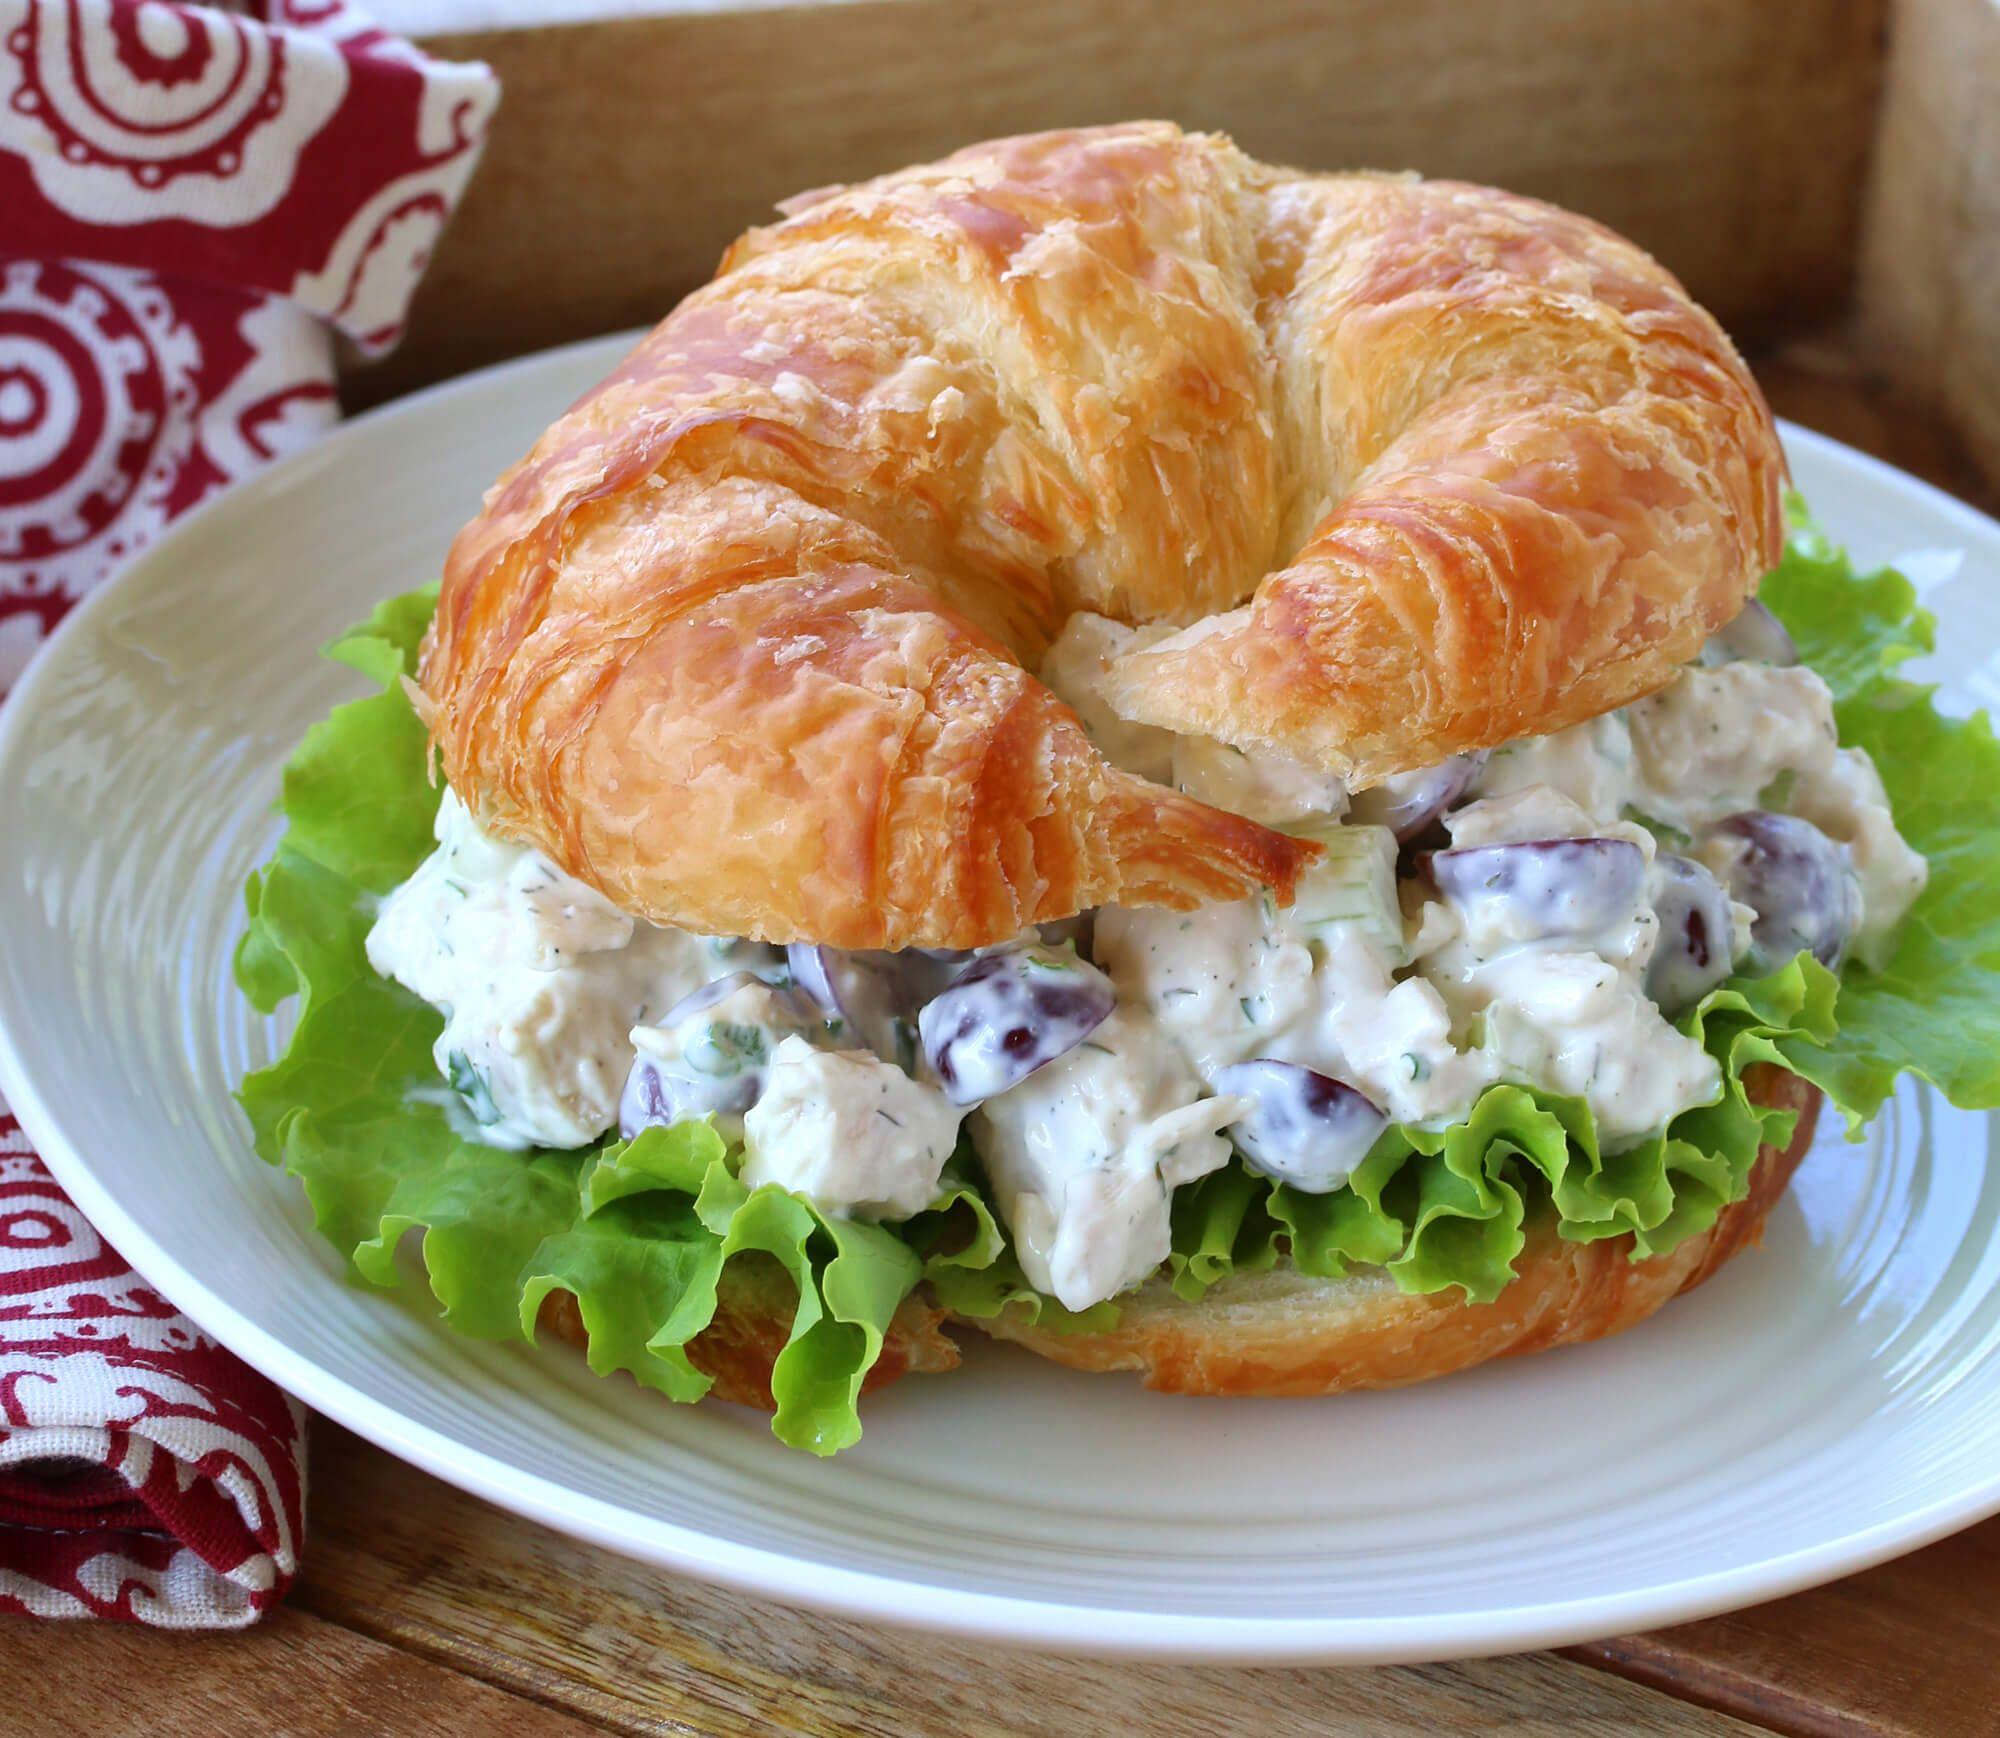 Best Chicken Salad Recipe Best Chicken Salad Recipe Chicken Salad Recipe Easy Chicken Salad Recipes